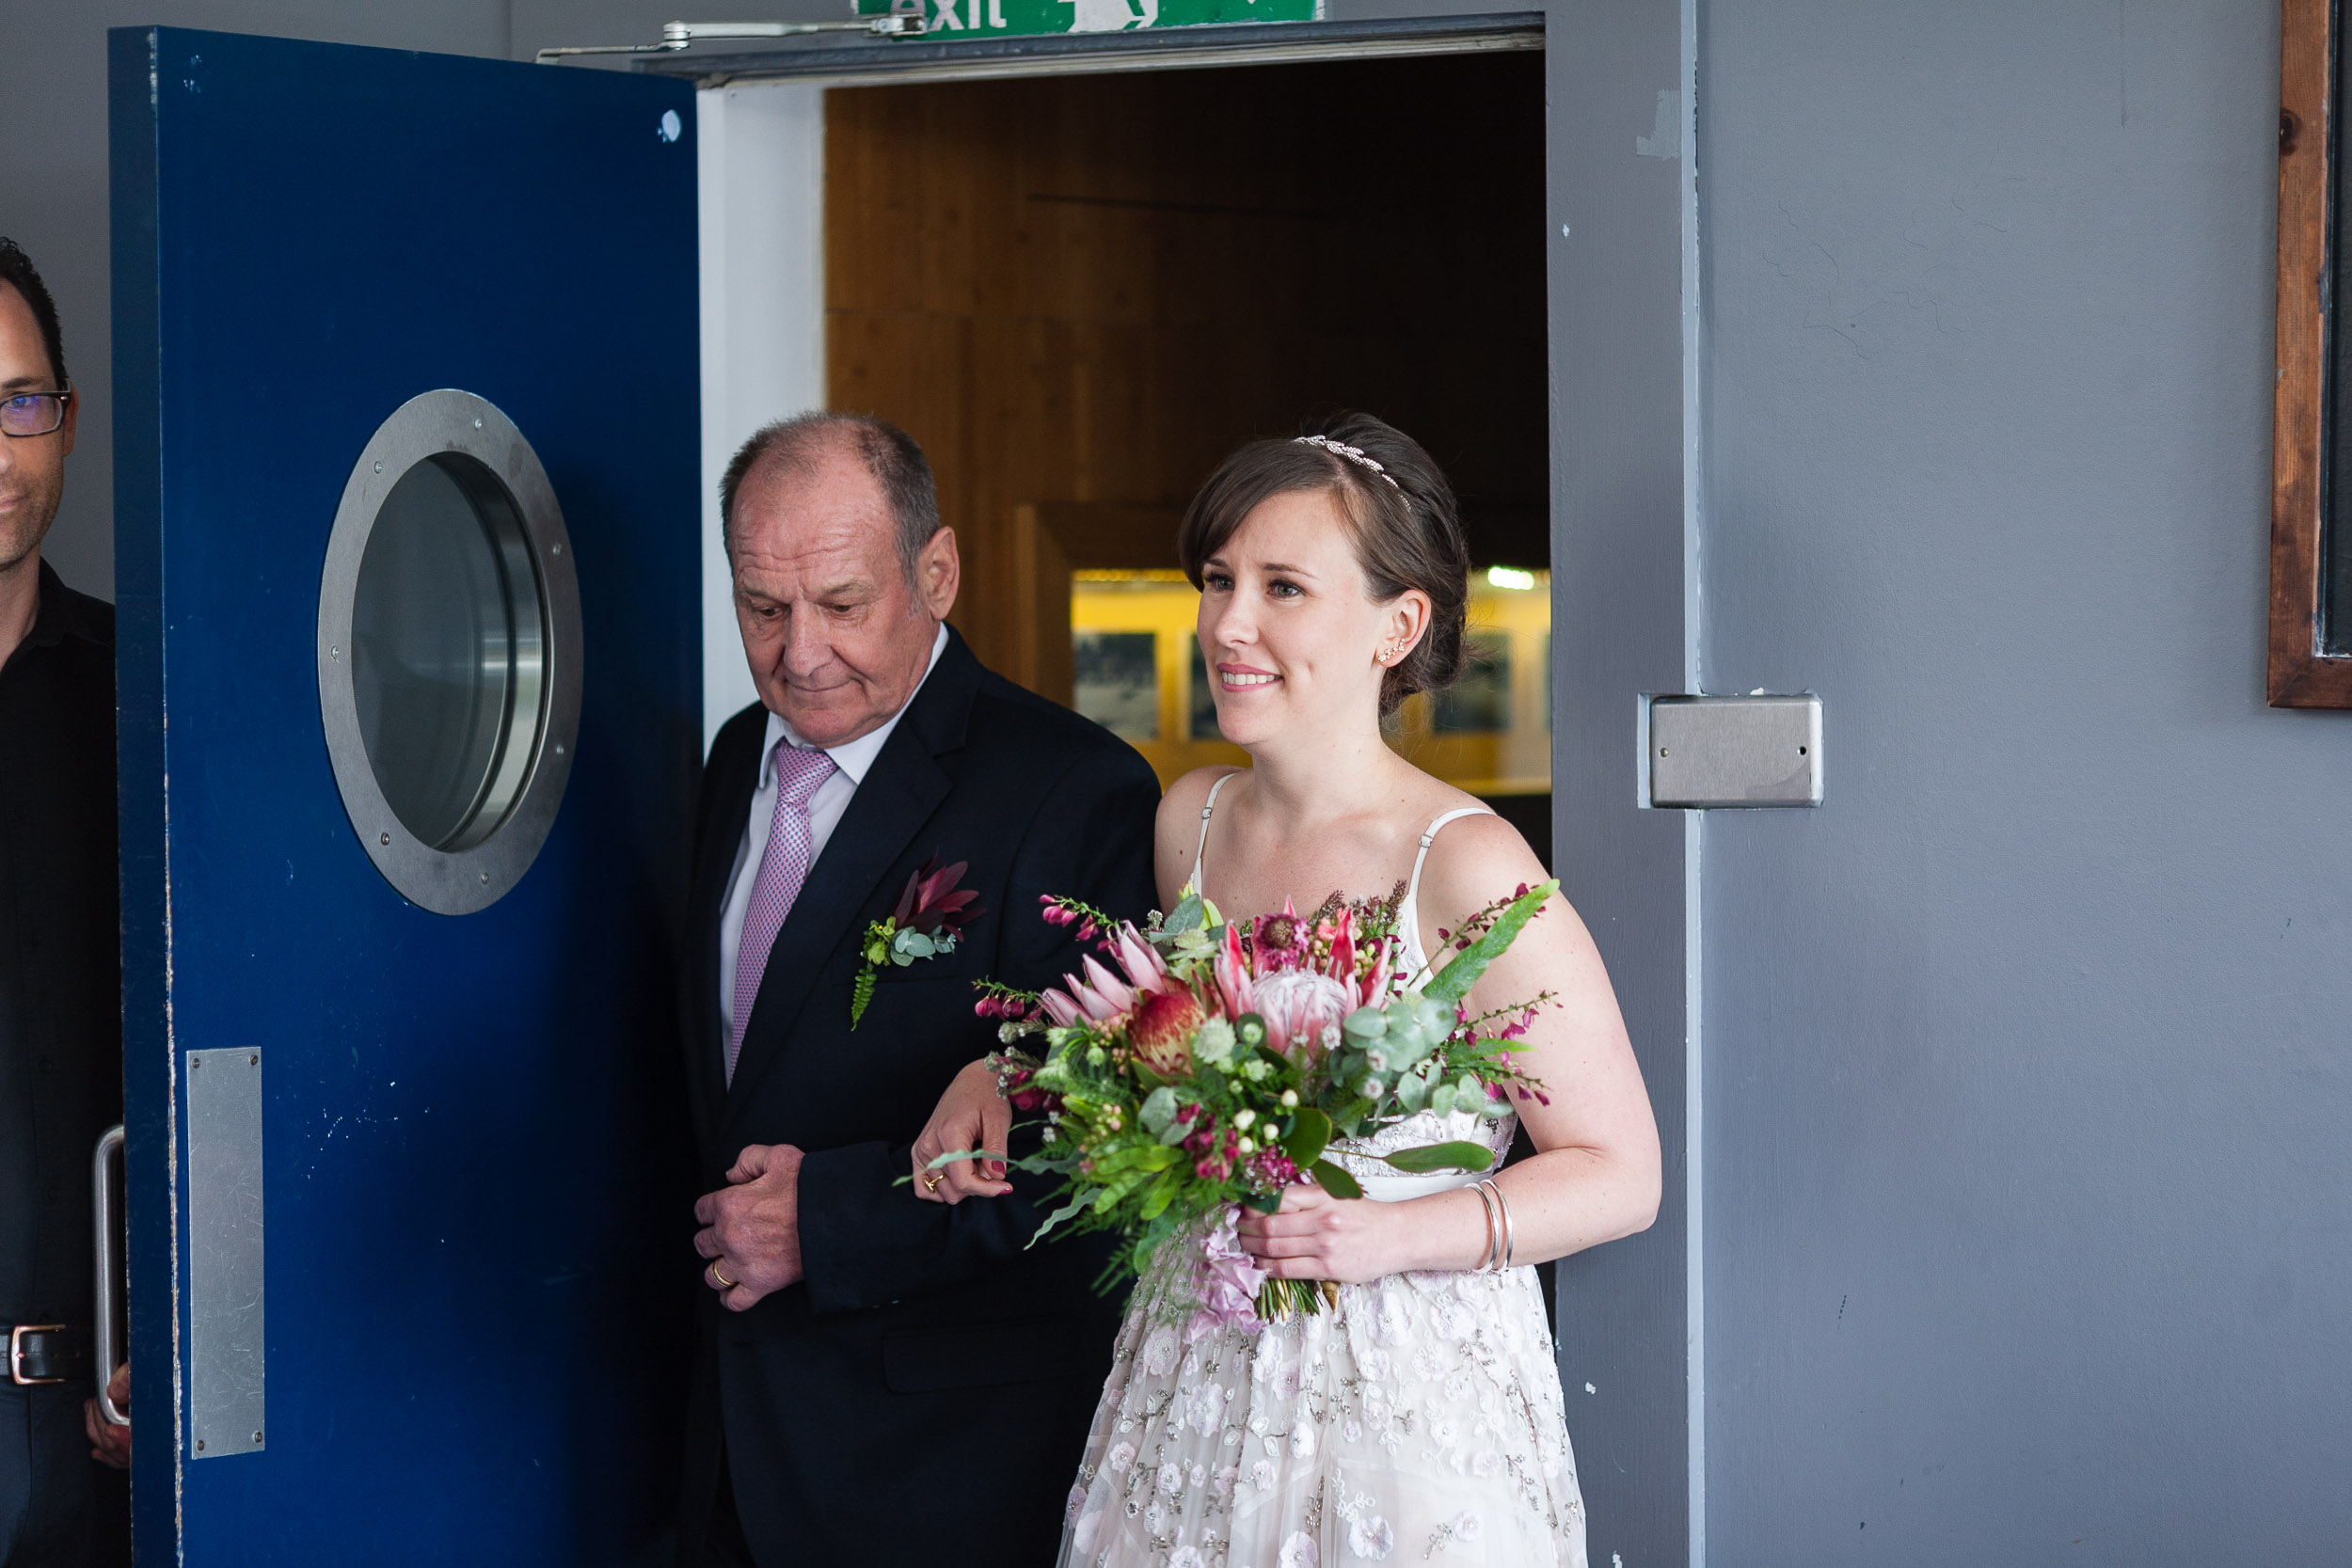 brockwell-lido-brixton-herne-hill-wedding-119.jpg